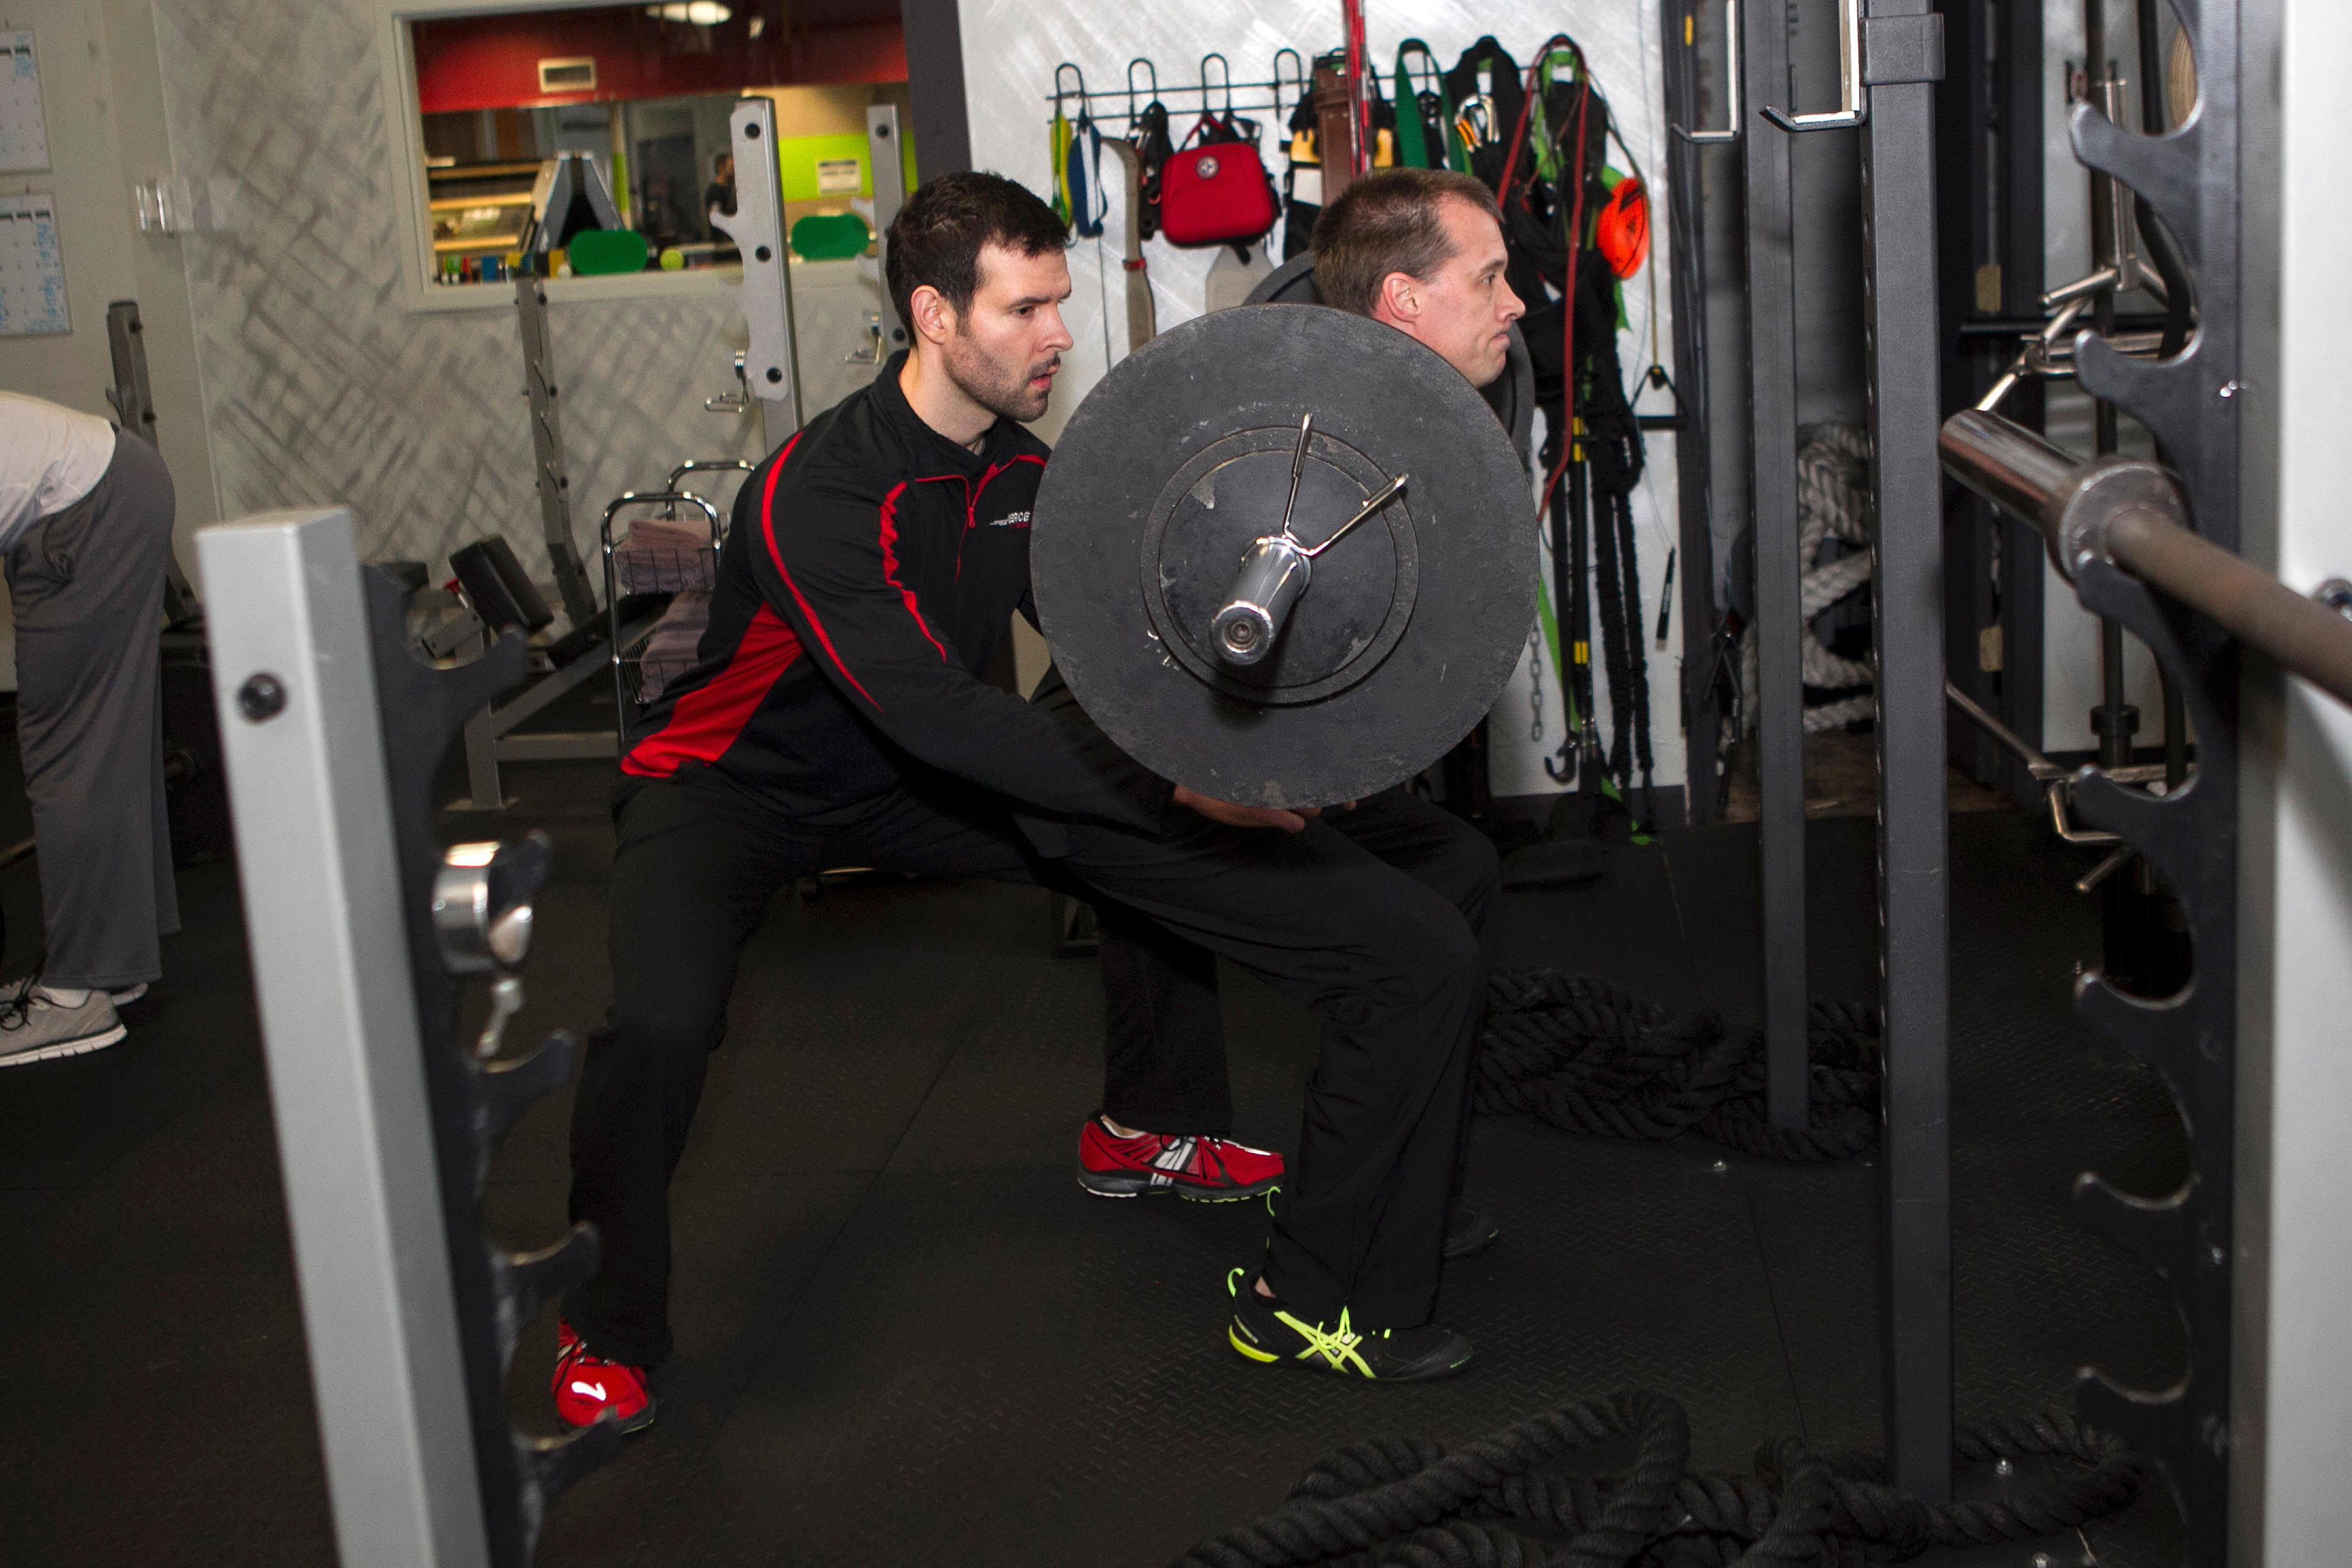 Fierce Fitness LLC image 1